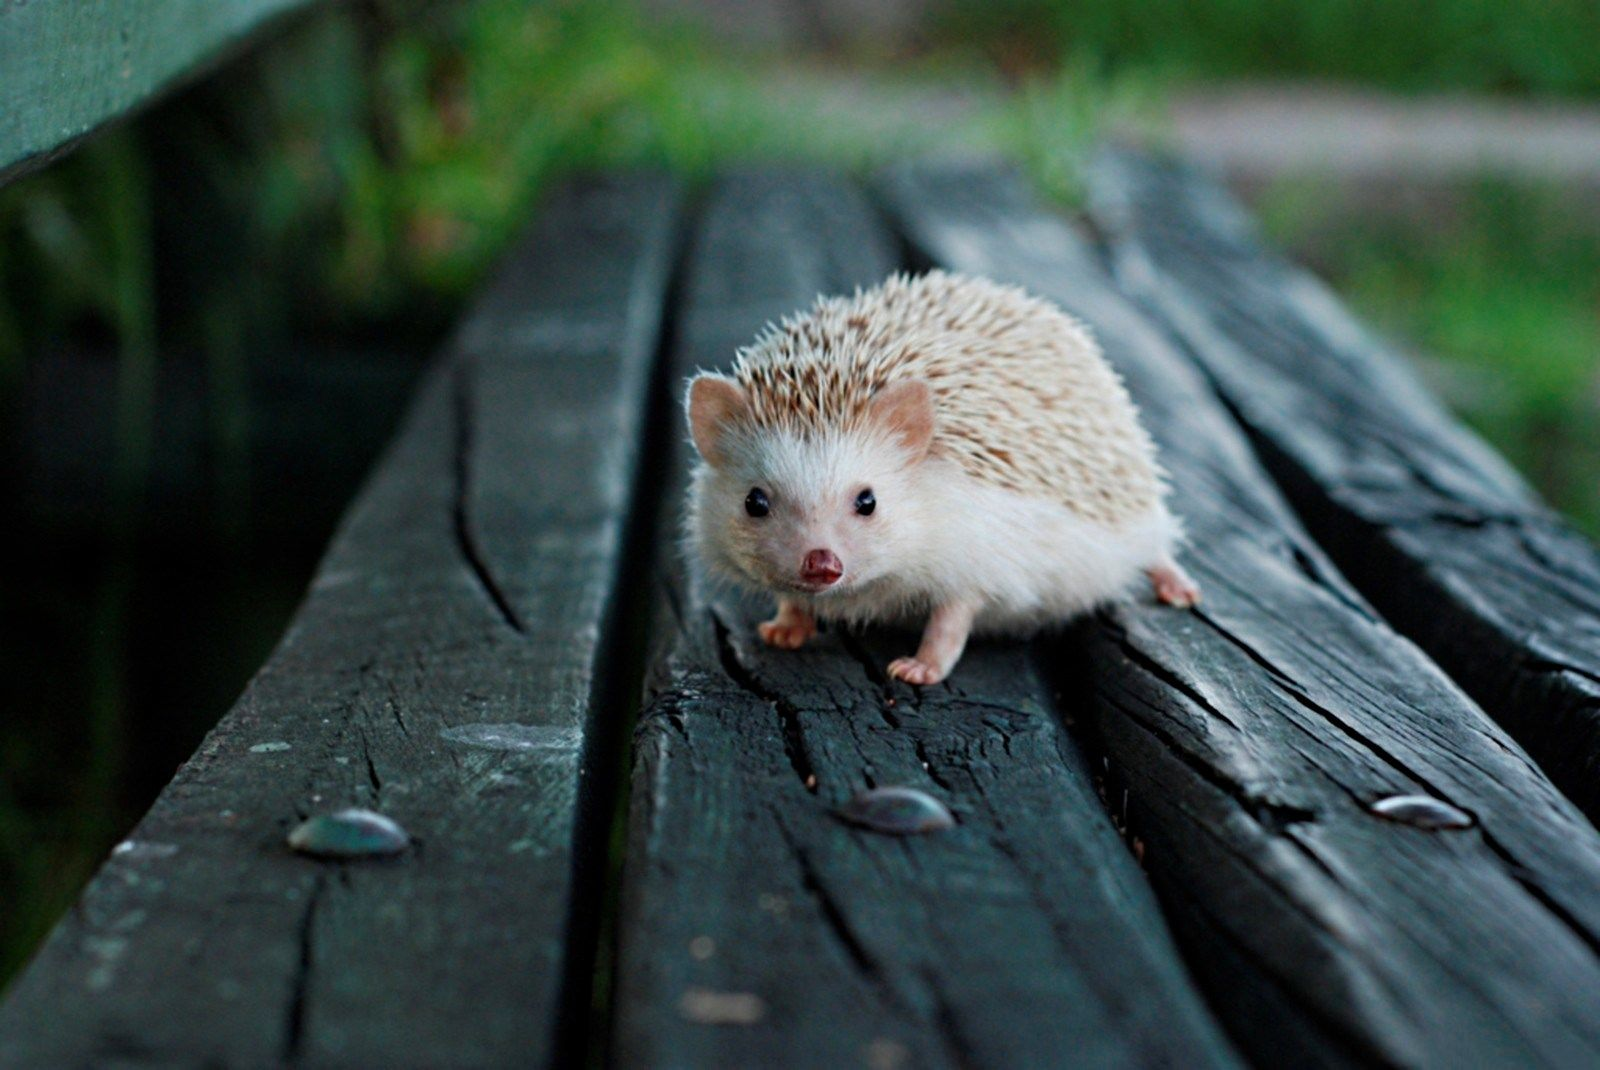 1600x1070 HD Widescreen hedgehog